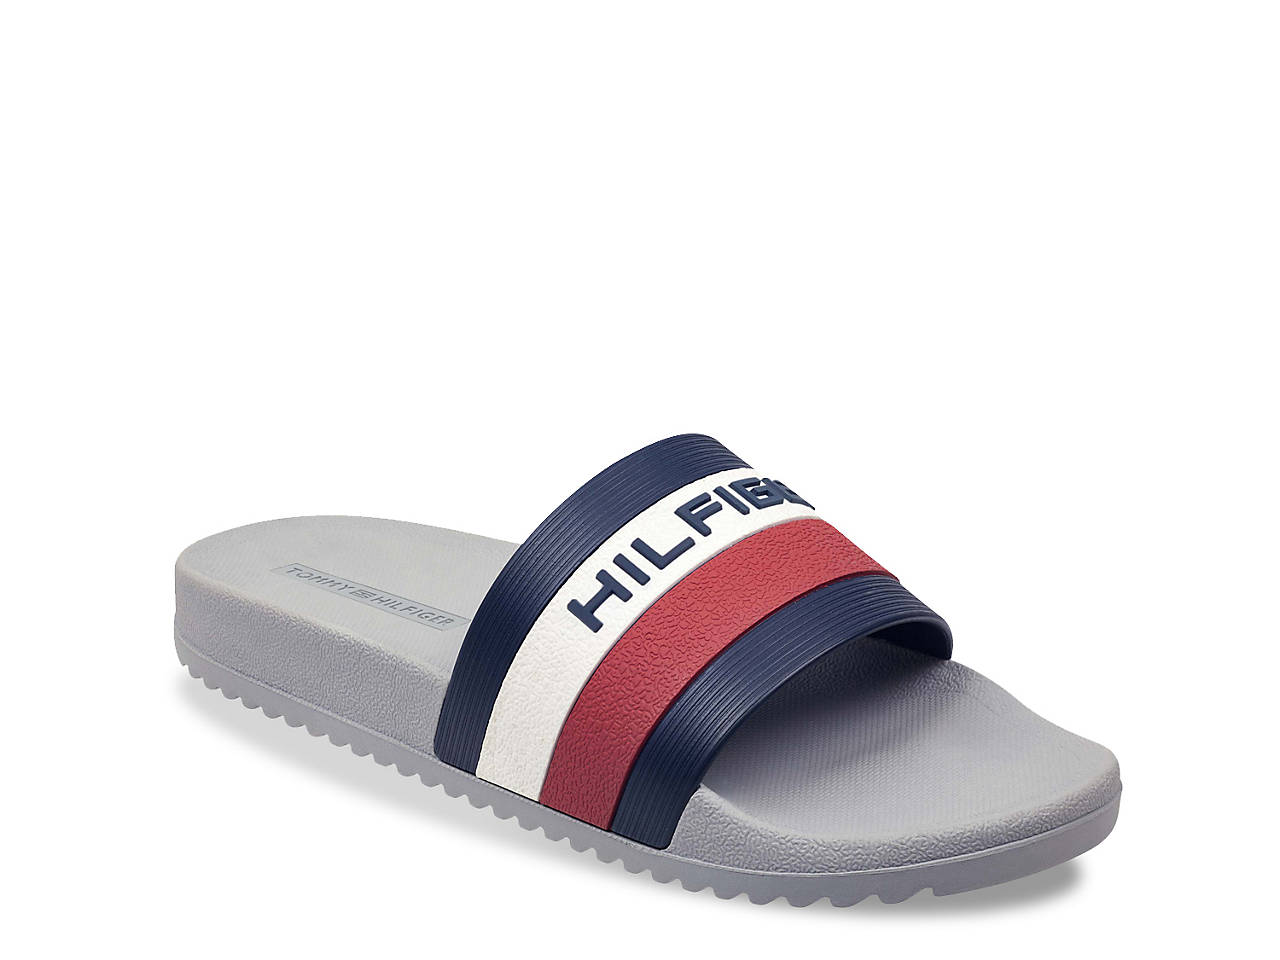 3a9b4a09c Tommy Hilfiger Raj Stripe Slide Sandal - Men s Men s Shoes